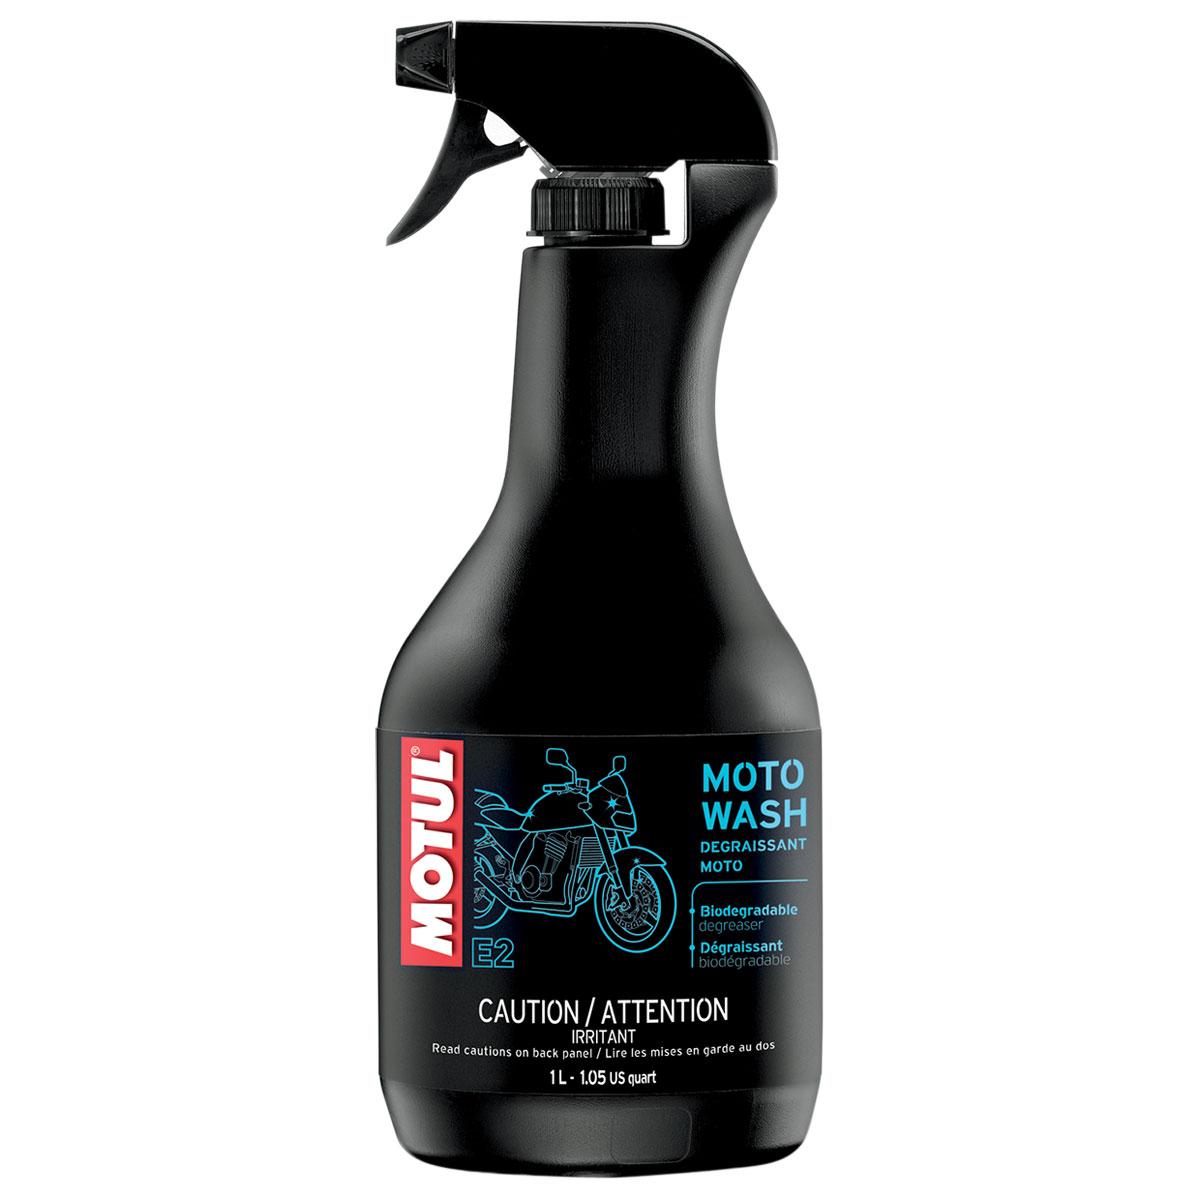 MOTUL Moto Wash Liter